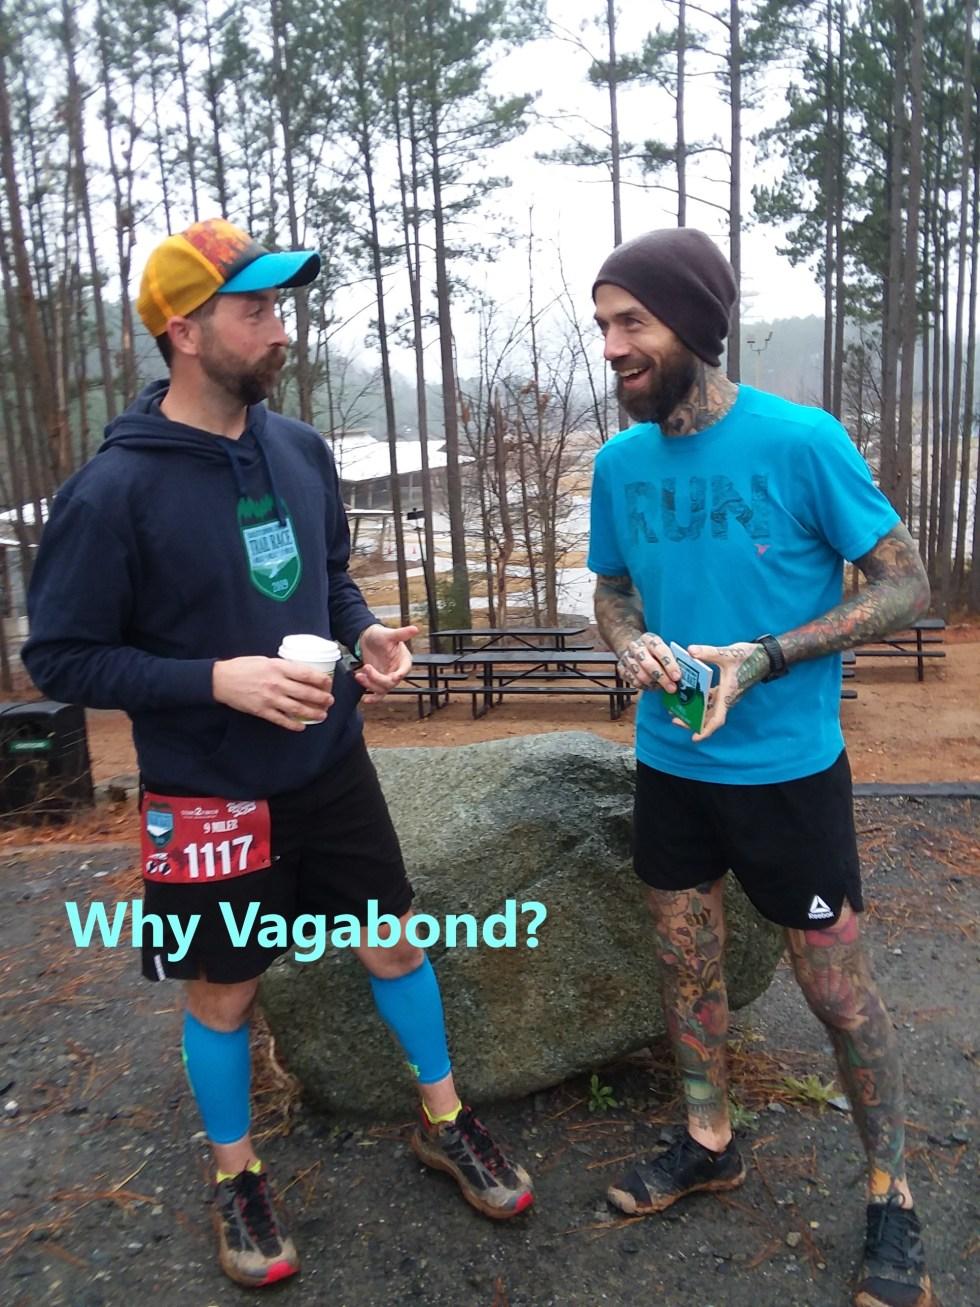 Why Vagabond